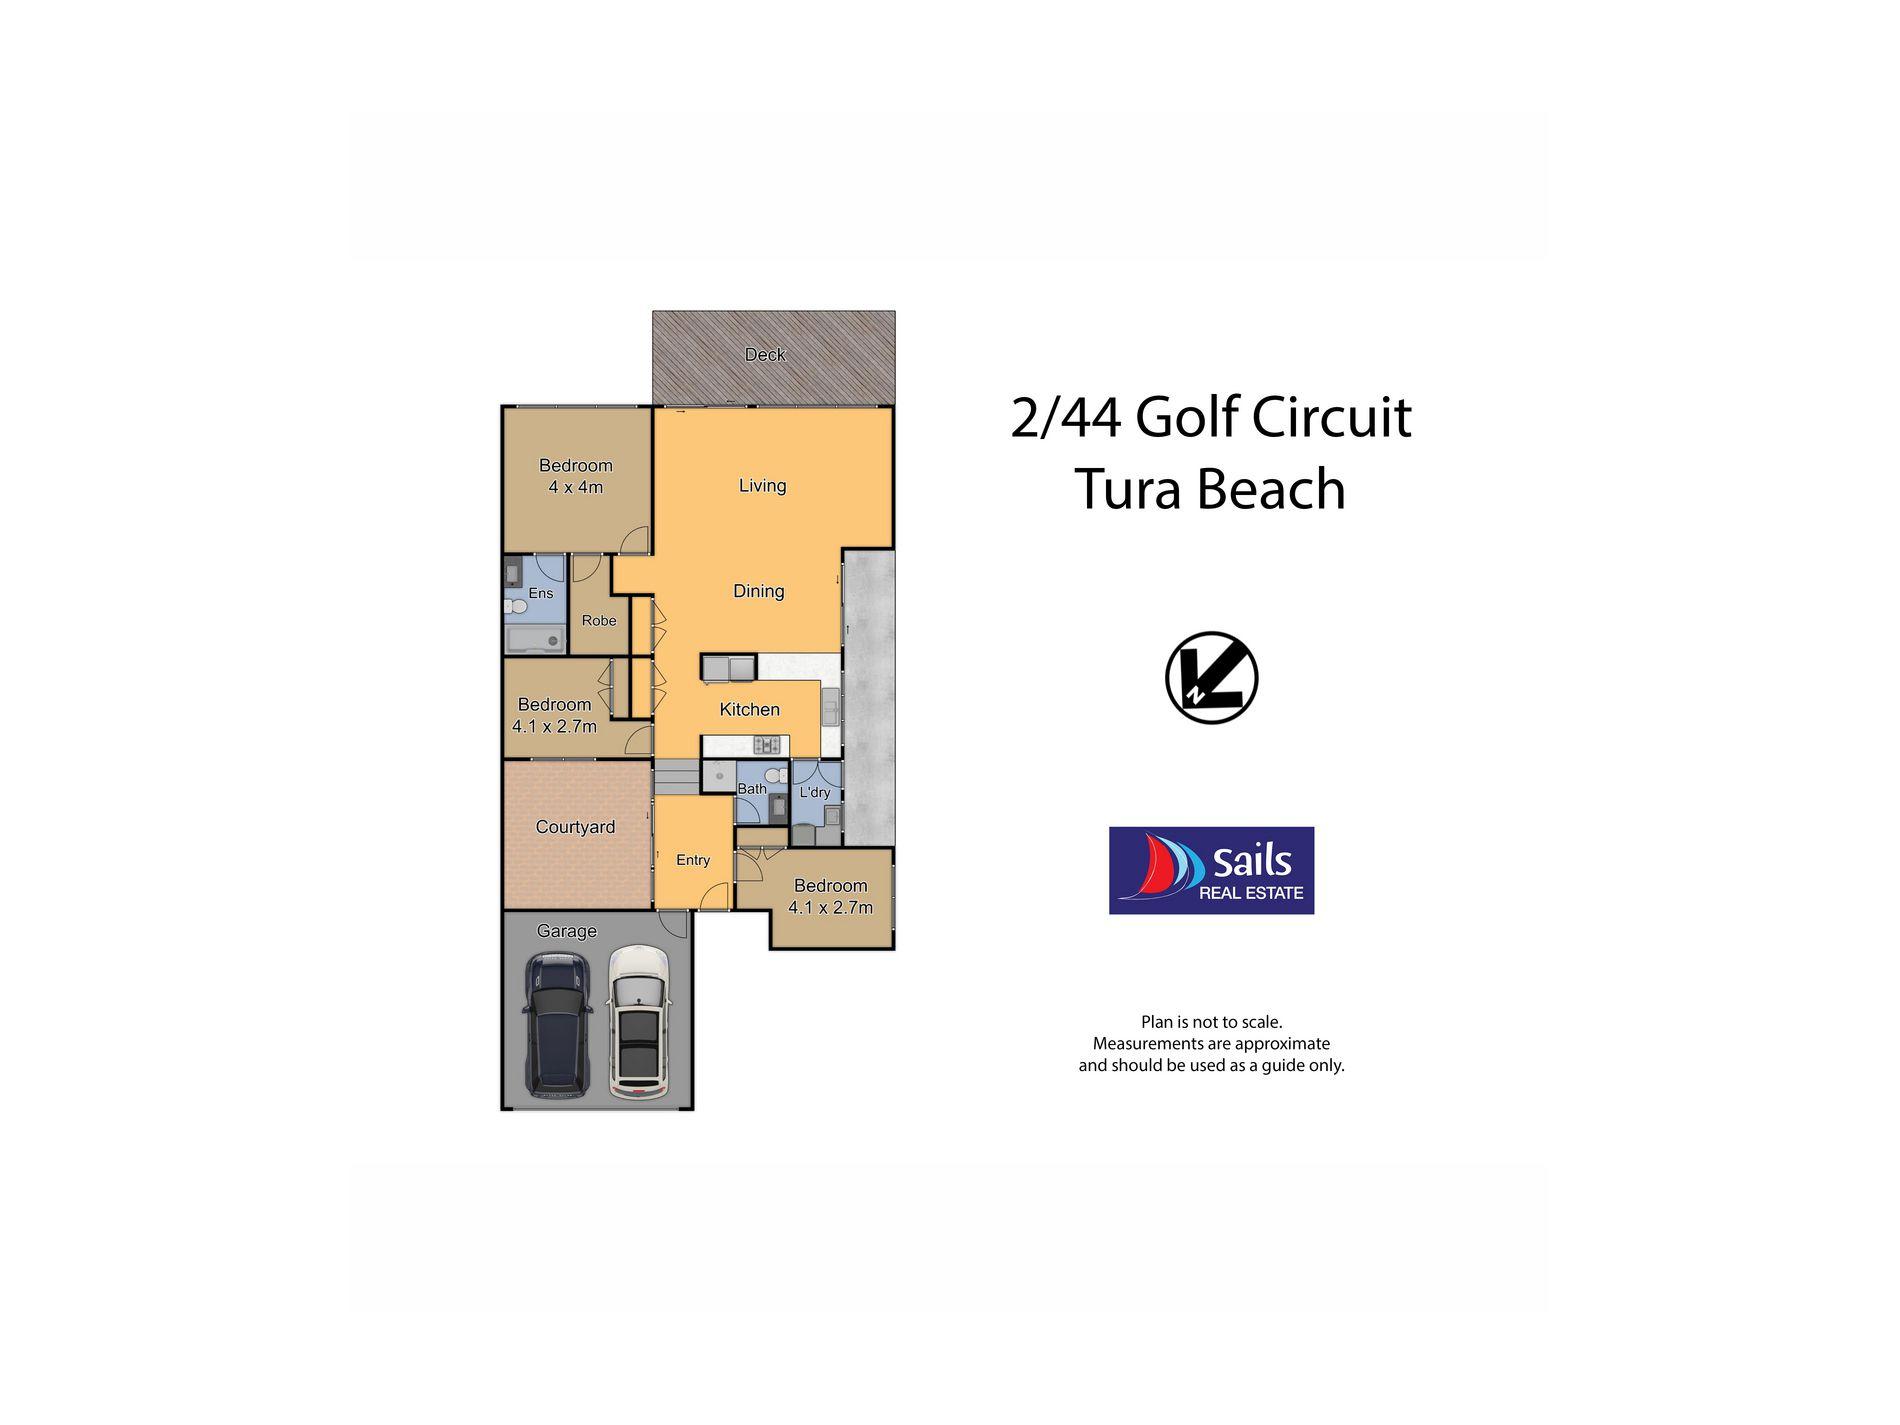 2 / 44 Golf Circuit, Tura Beach